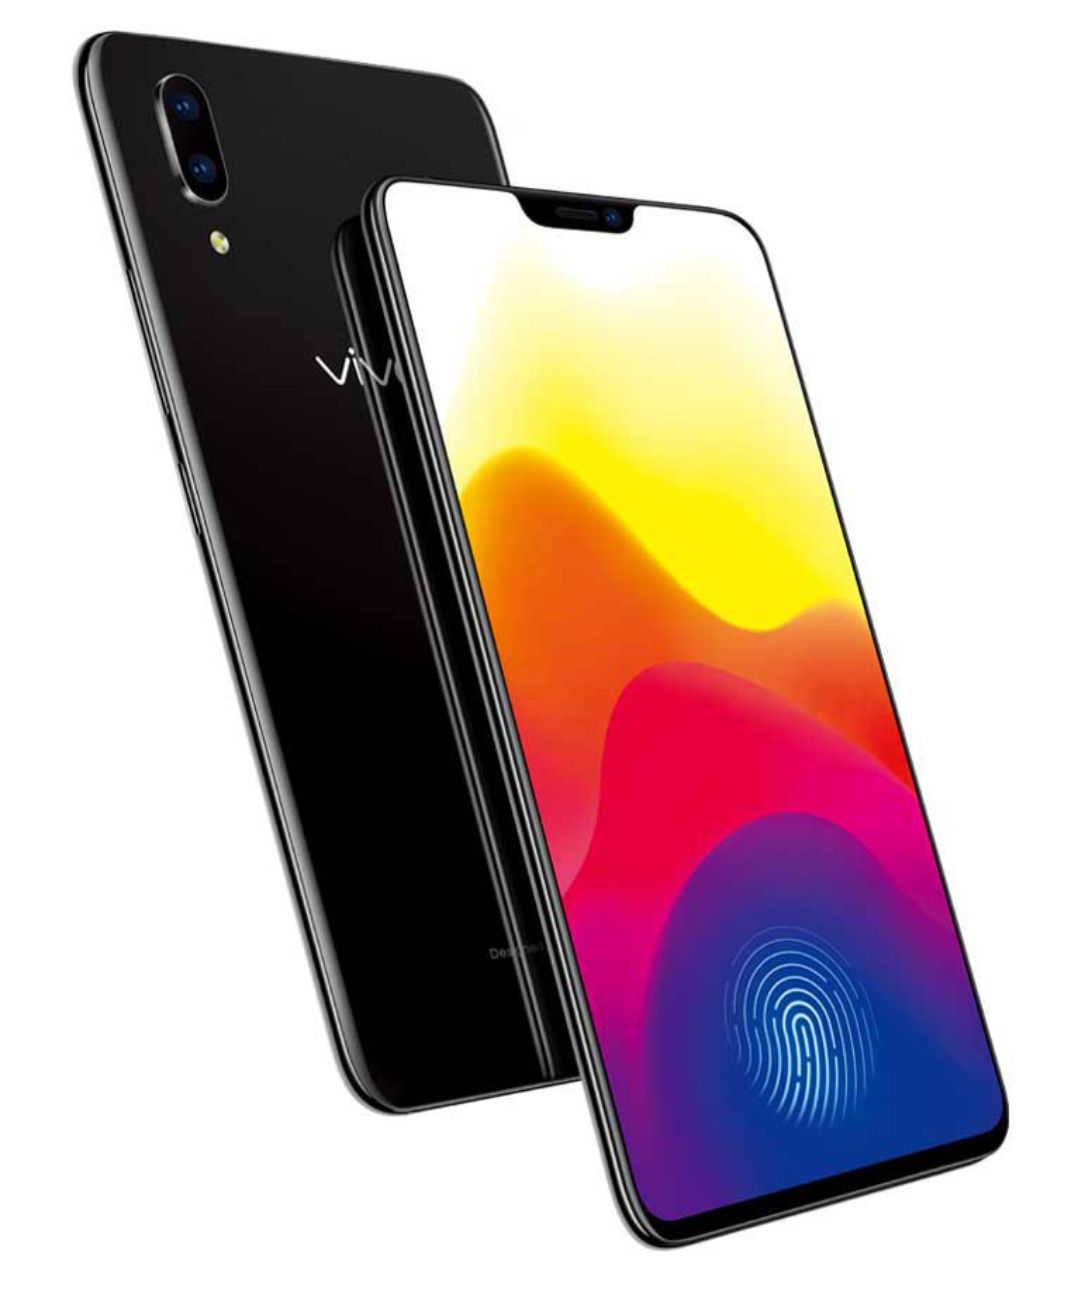 Vivo X21 Specifications